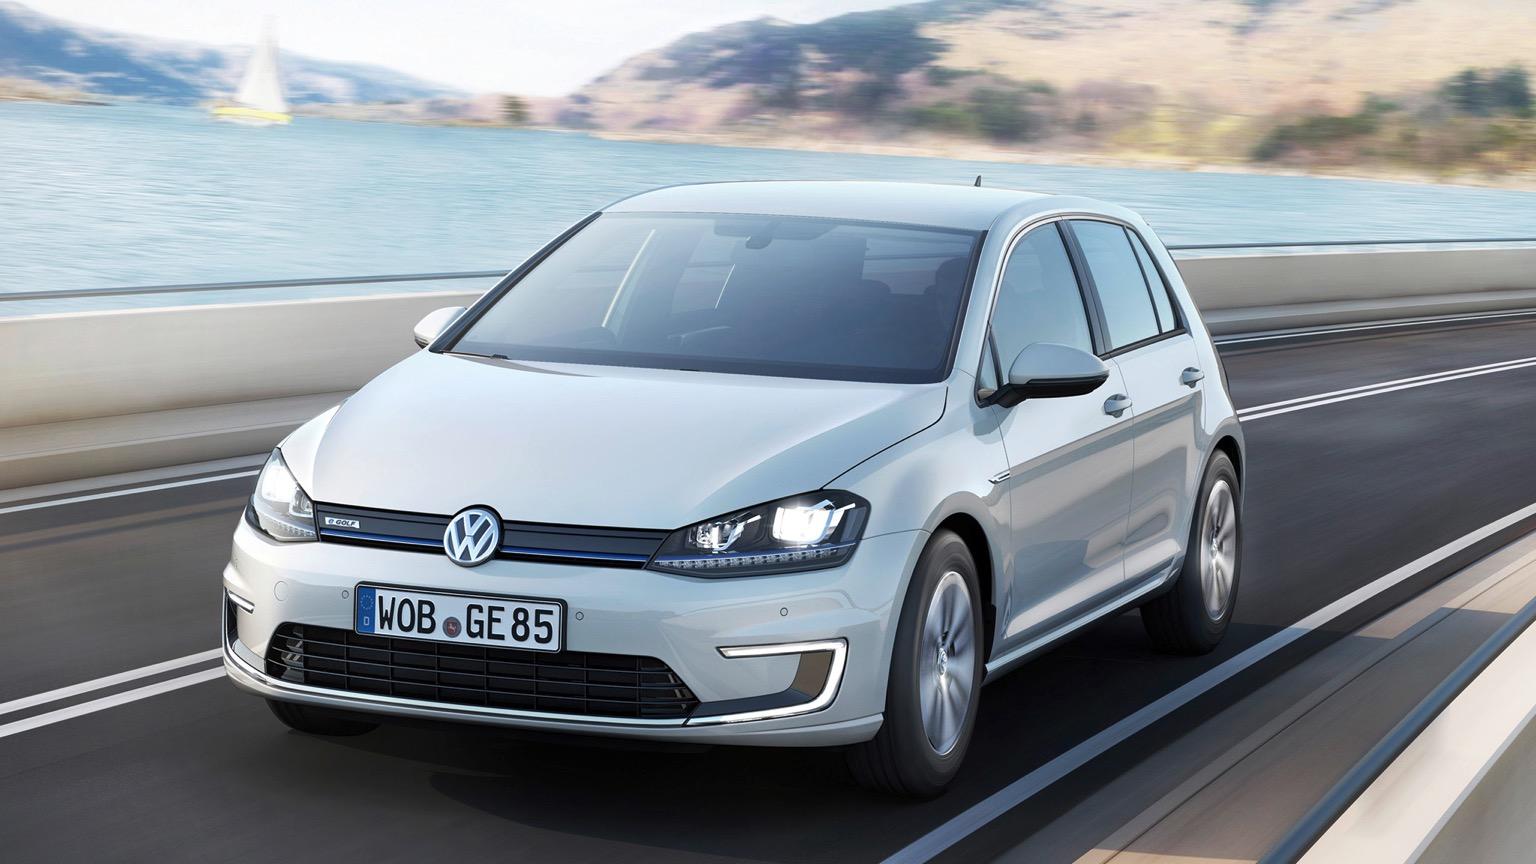 Volkswagen e-Golf (2014)